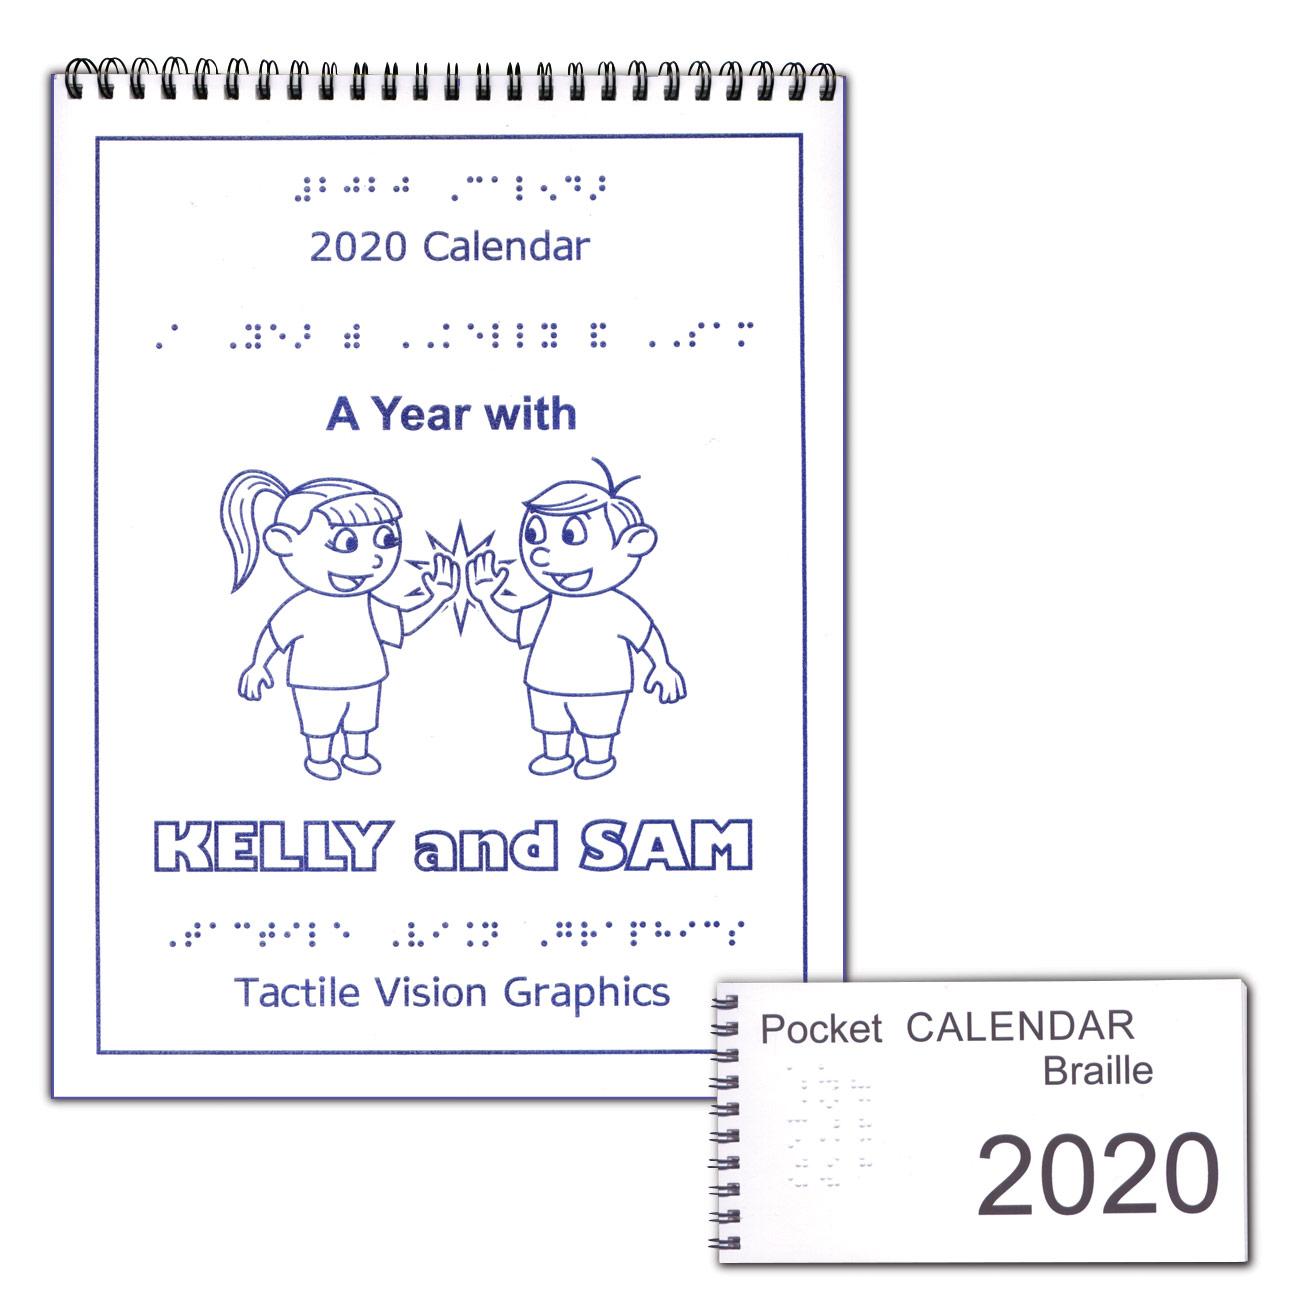 Braille 2020 Calendar with 2020 Pocket Calendar